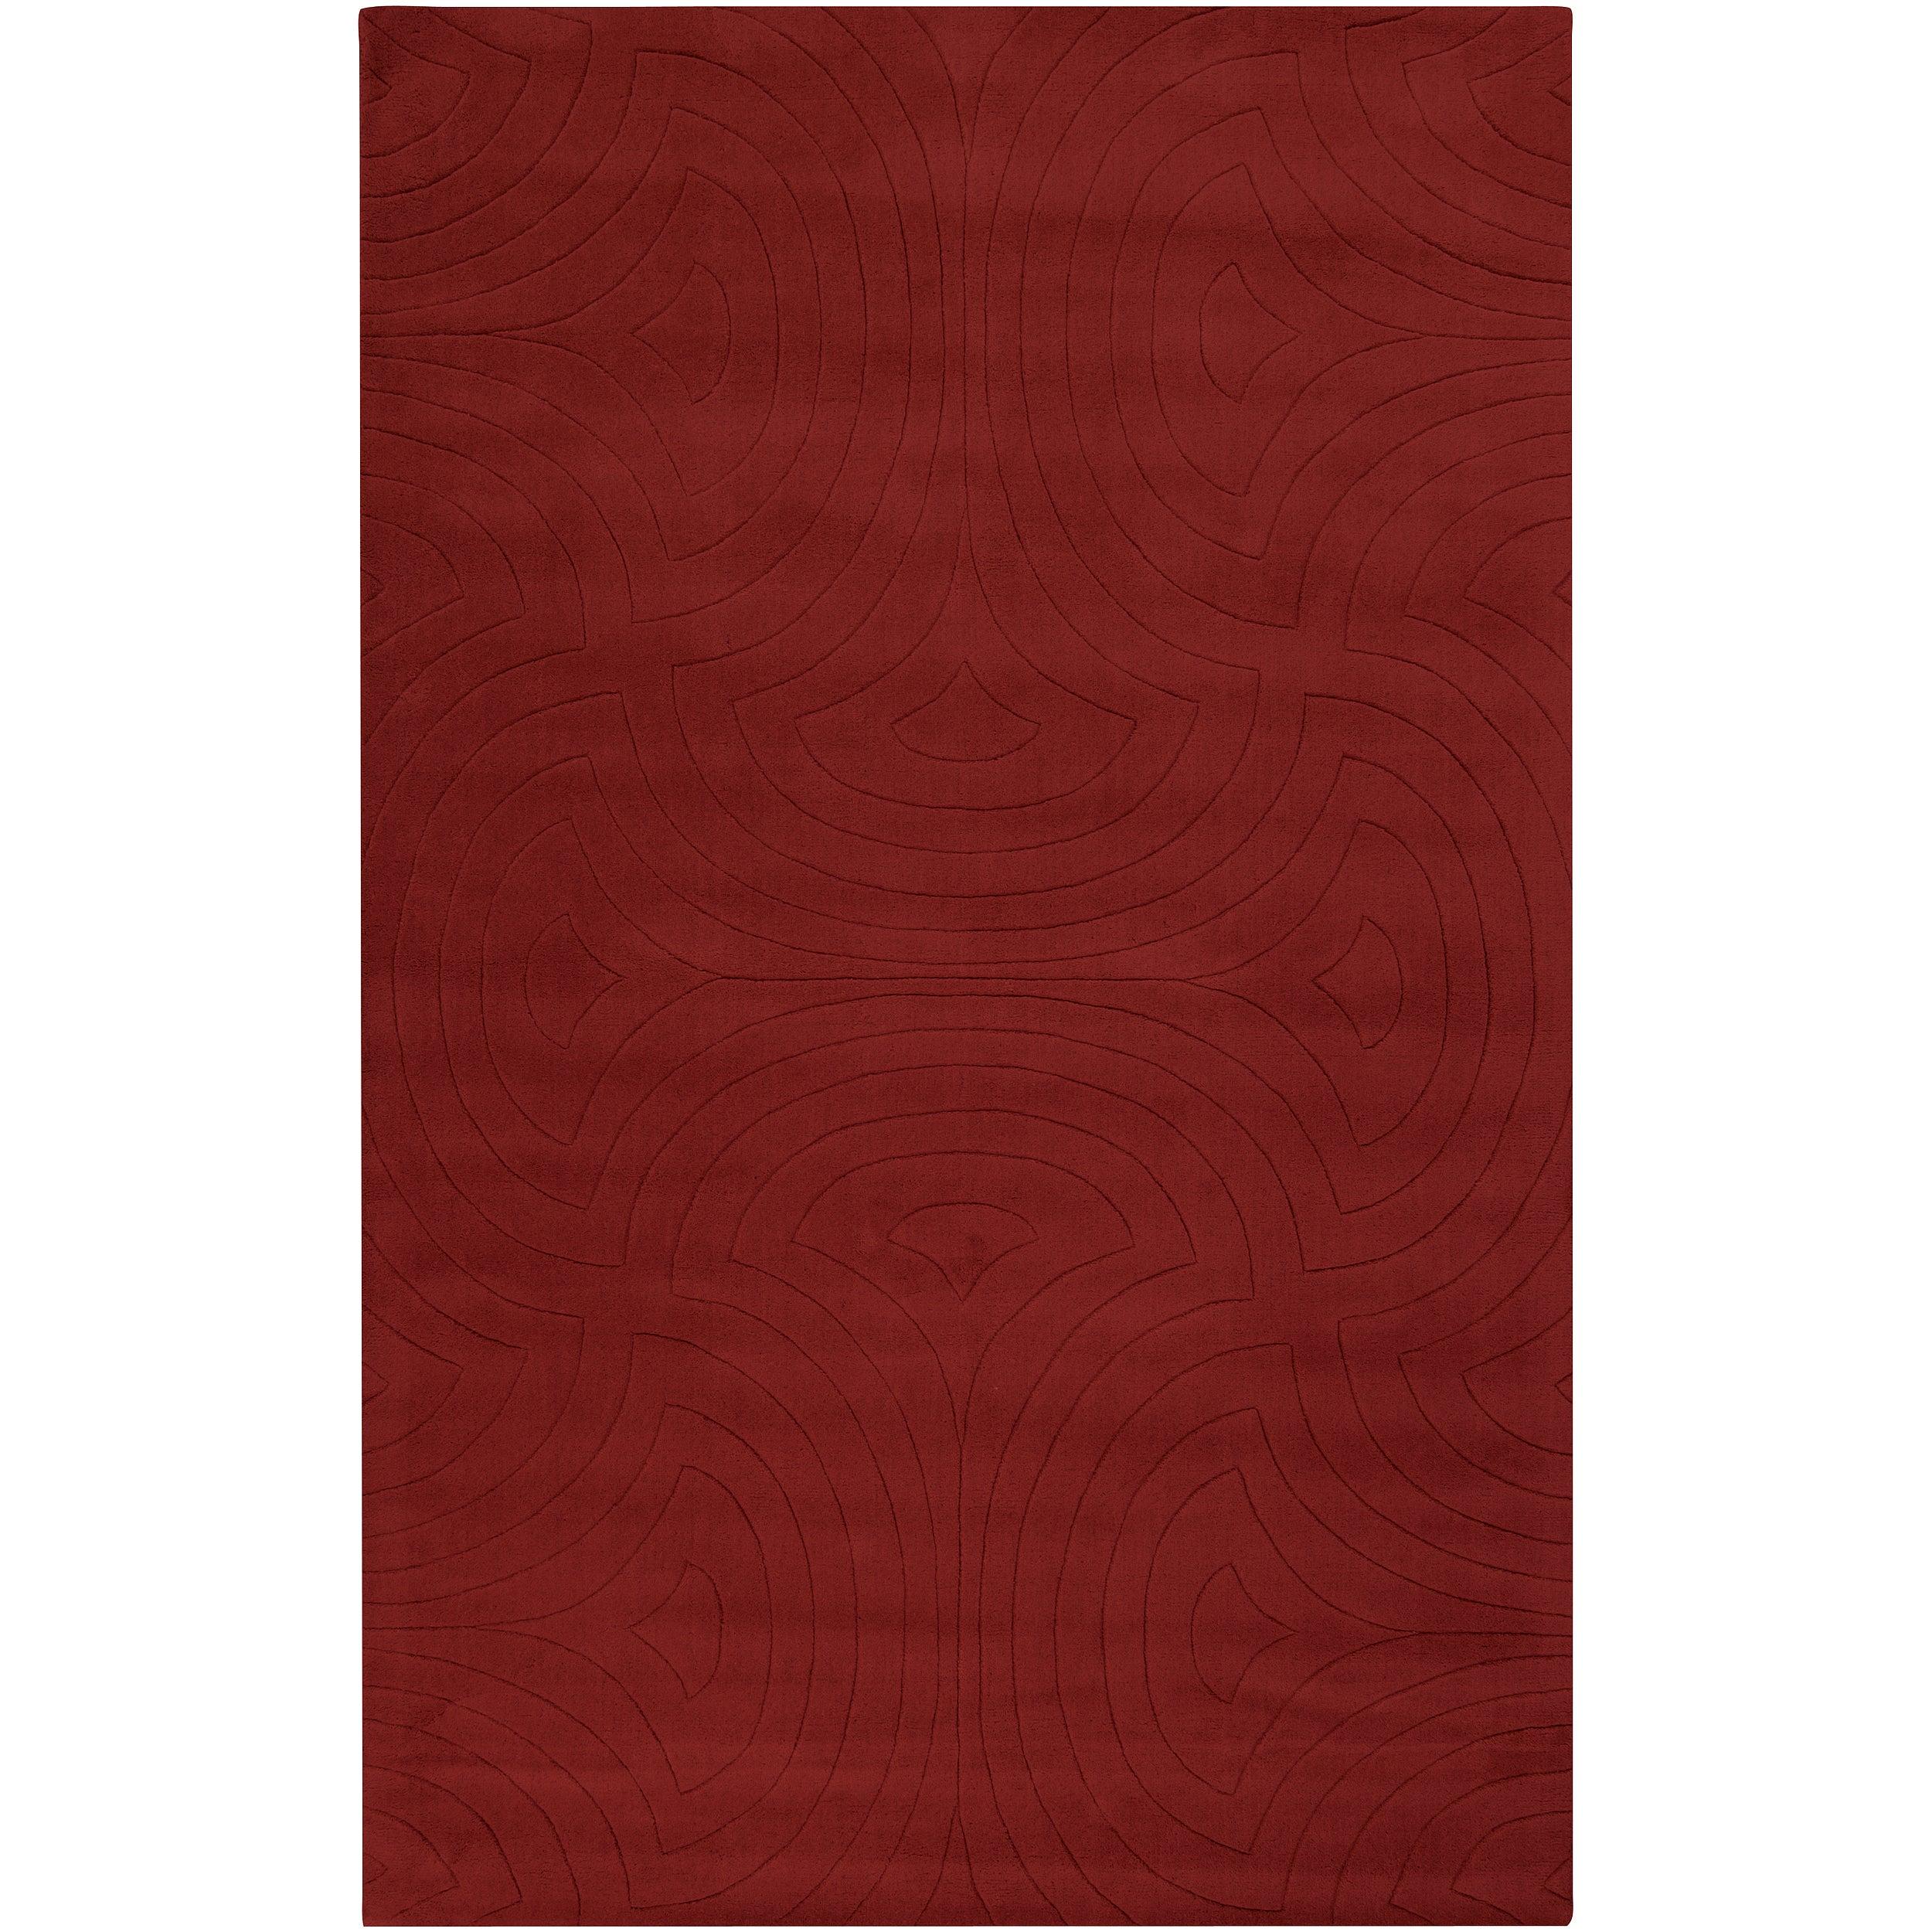 Candice Olson Loomed Red Scrumptious Geometric Plush Wool Rug (3'3 x 5'3)